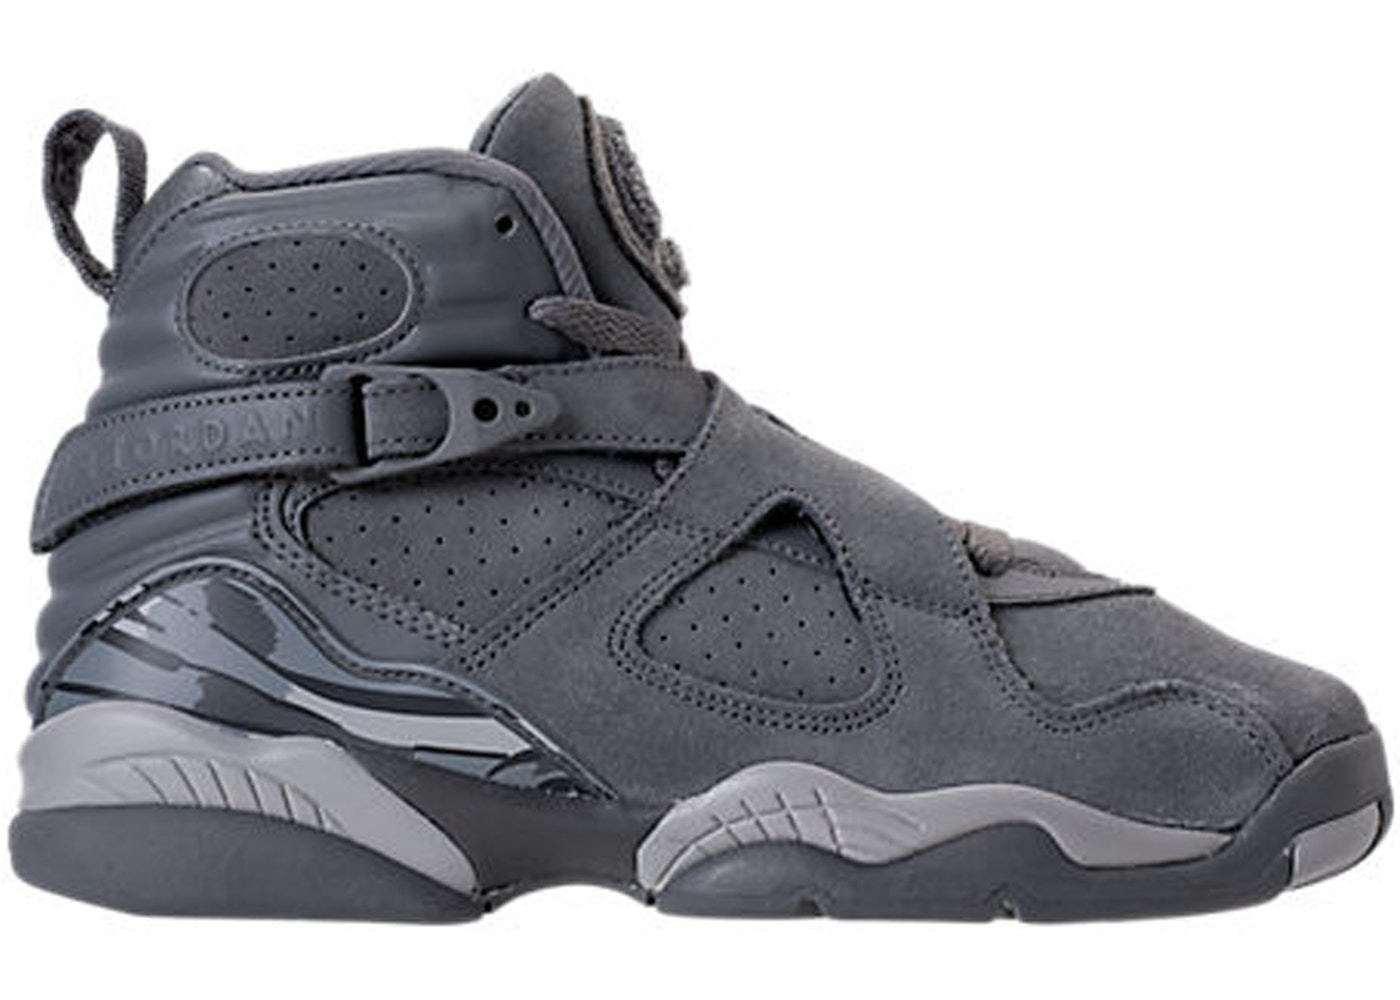 eb2eb34eea1 Air Jordan 8 Shoes - New Highest Bids